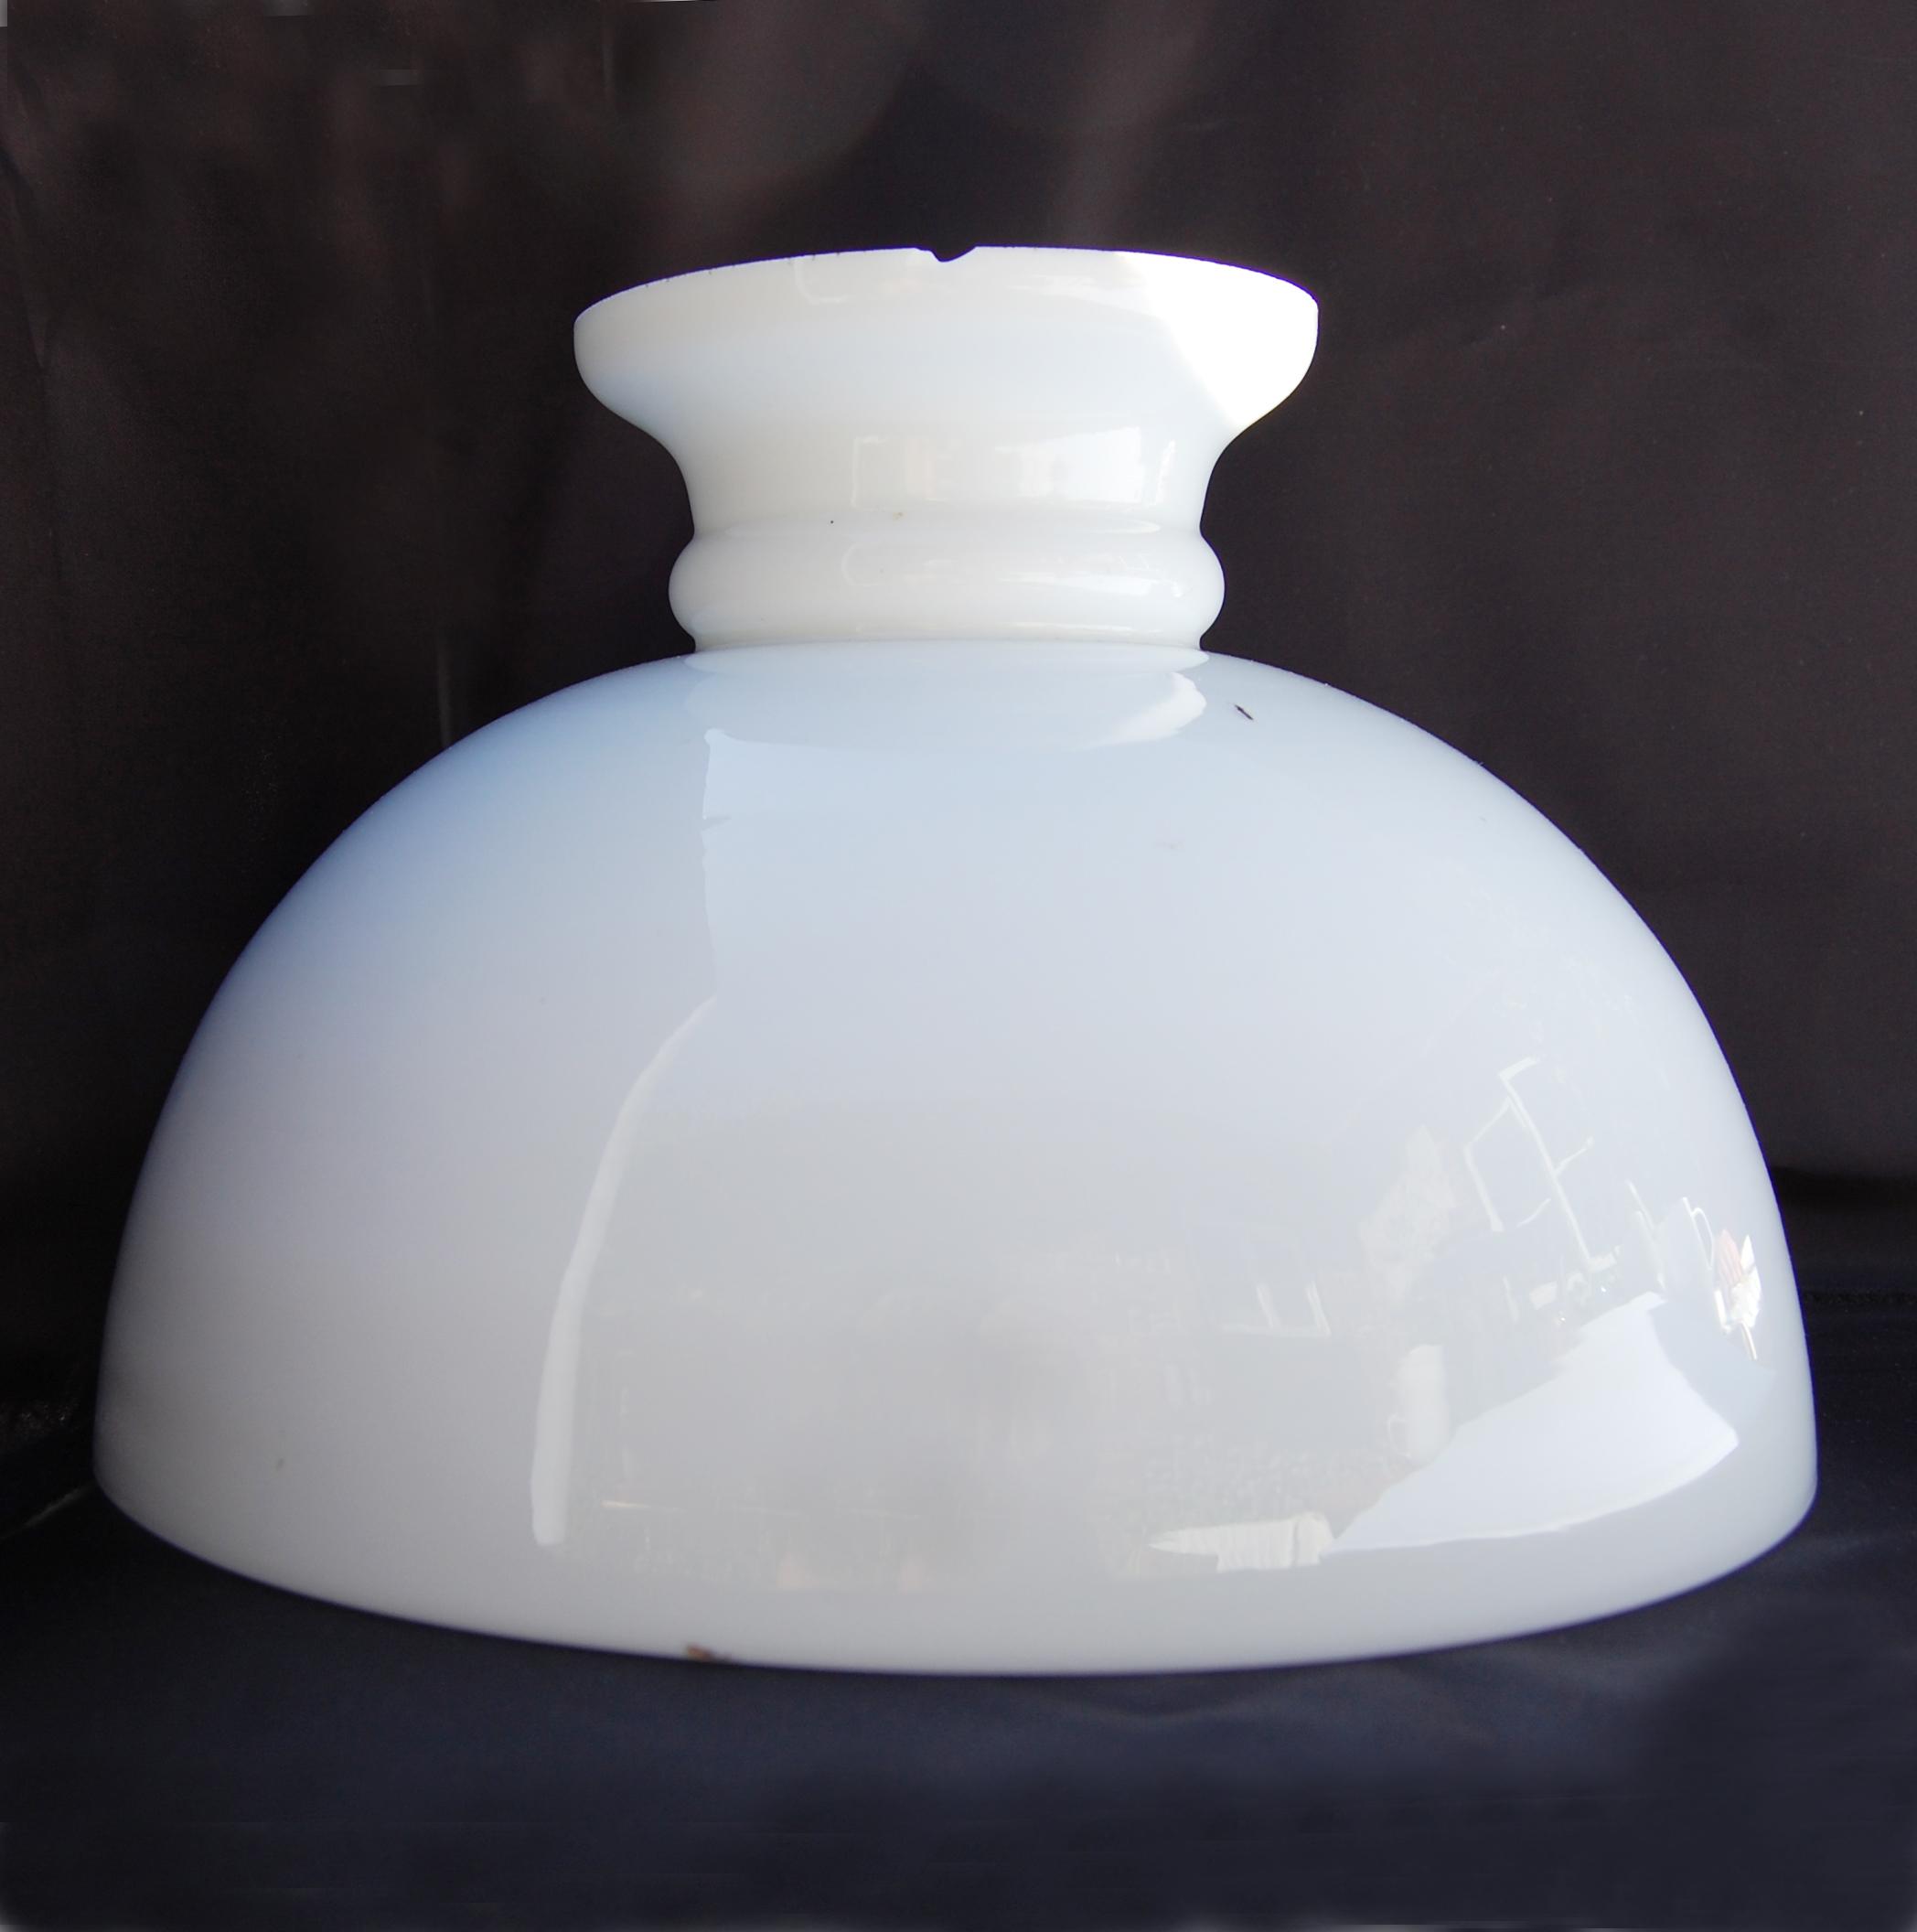 Dome Lamp Shades: Antique Dome Opal Oil Lamp Shade No.56 :: English Lamp Company